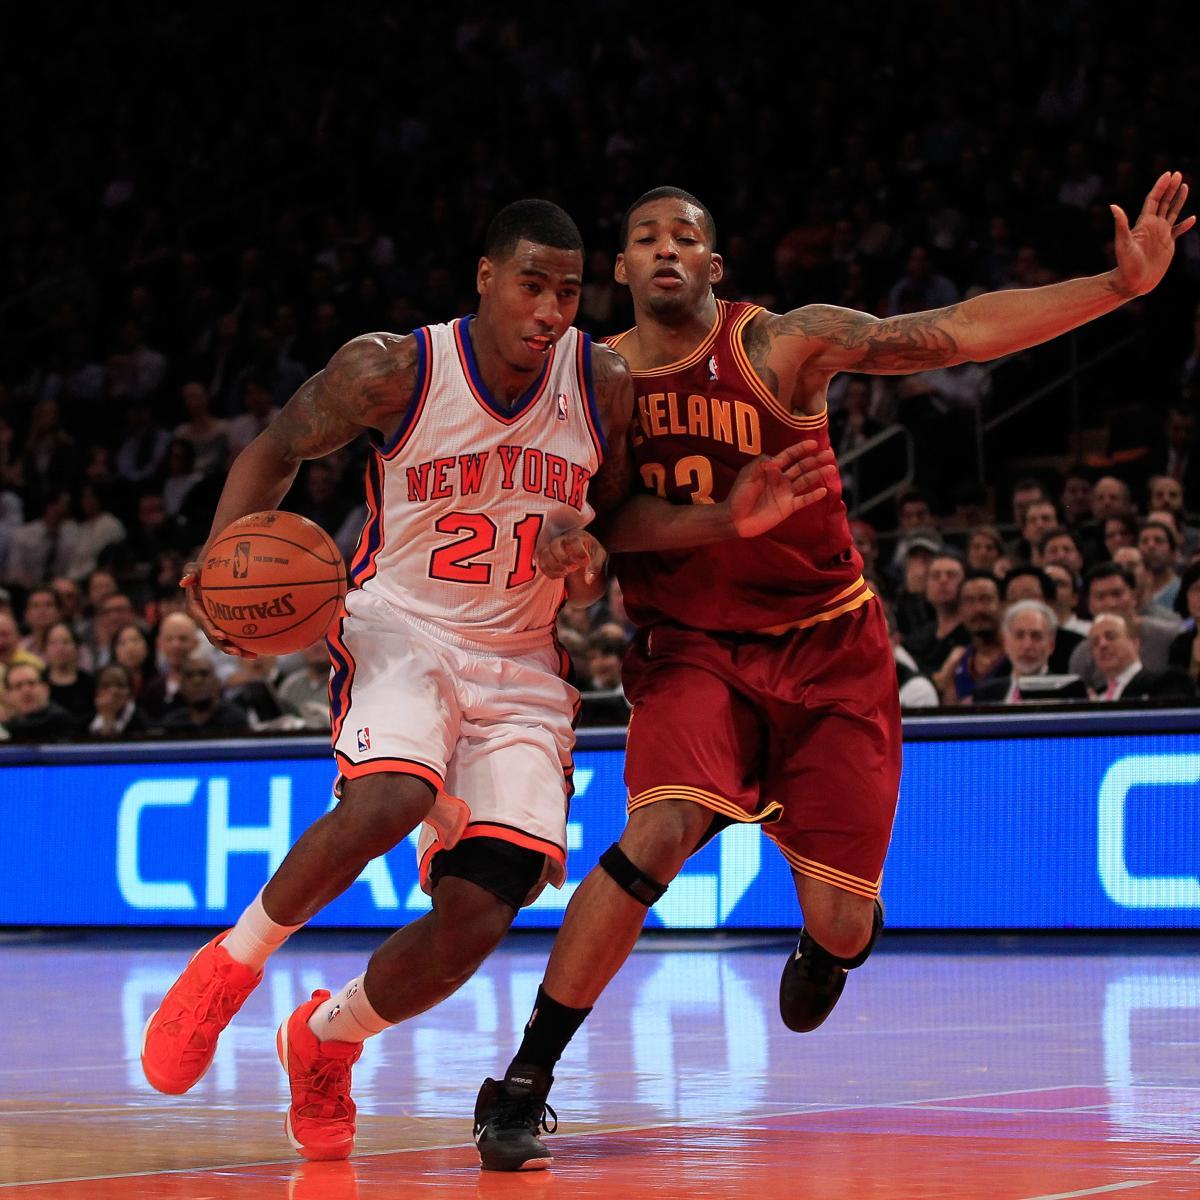 Nuggets Injury Report: NBA Injury News: Iman Shumpert's Return Won't Fix New York